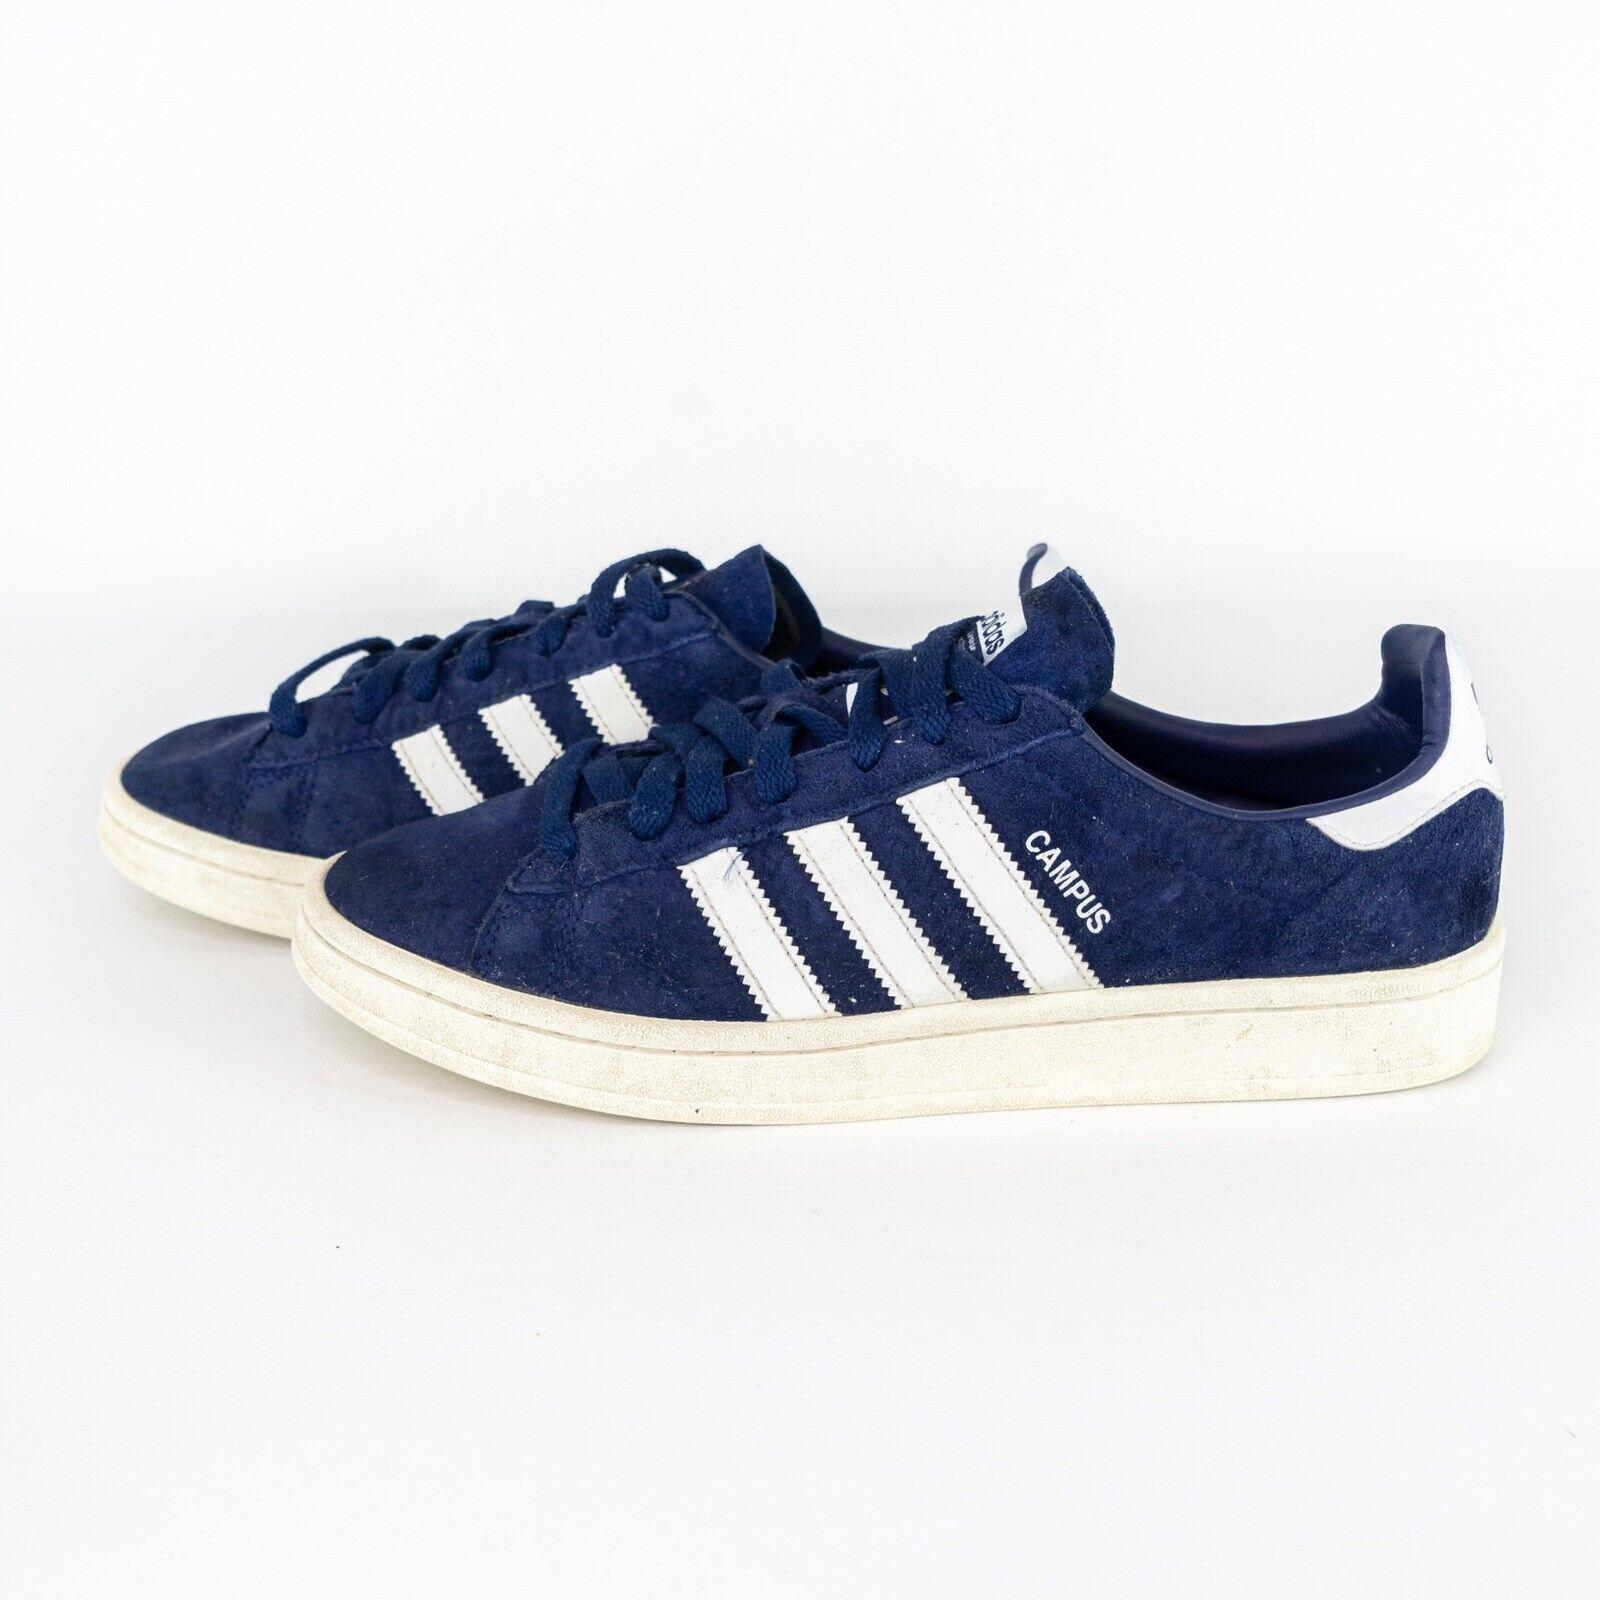 adidas Campus Bz0086 Blue for sale